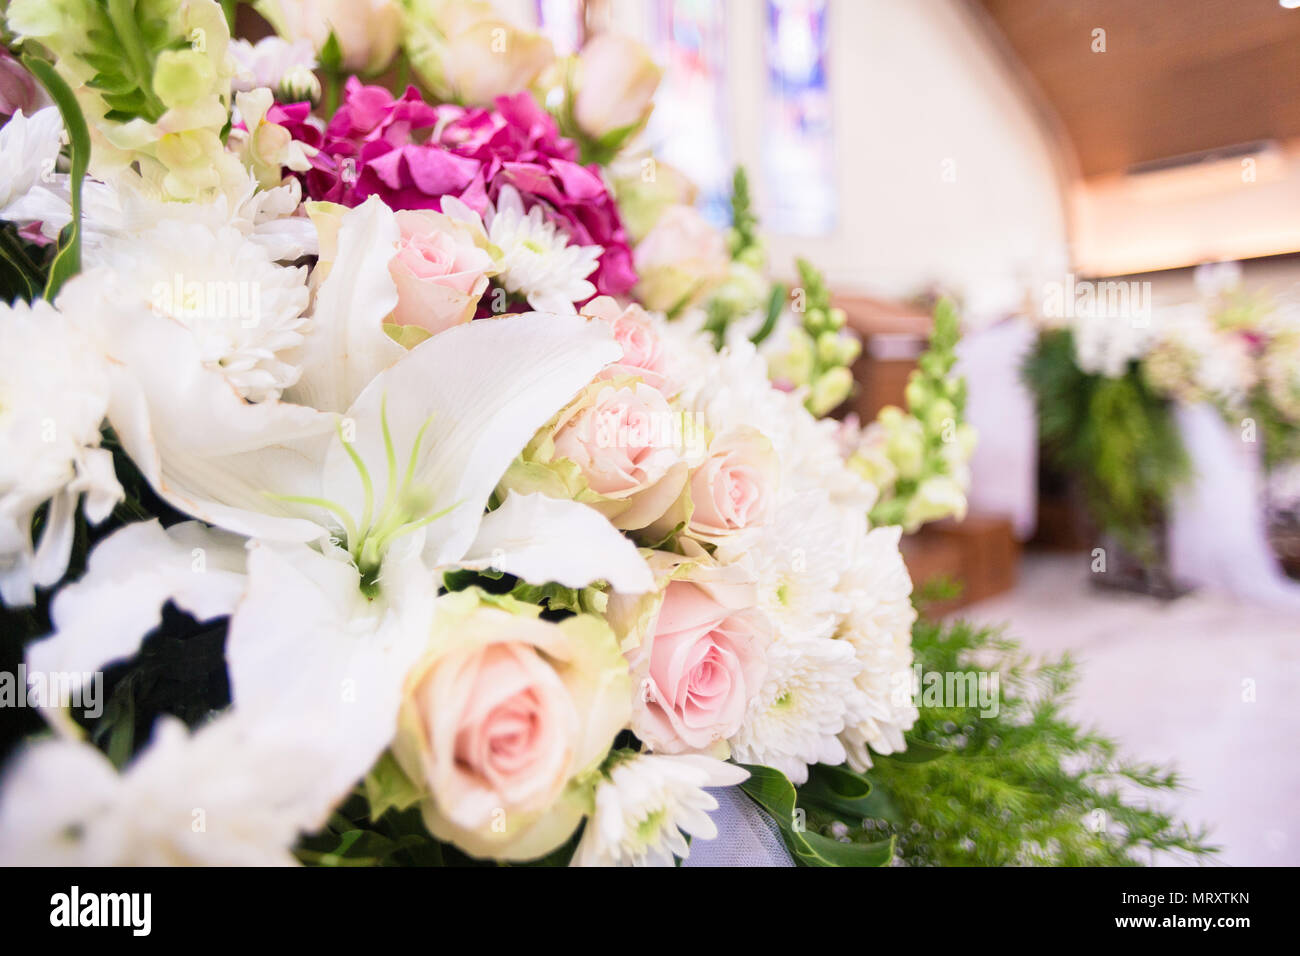 Wedding flower bouquet in church stock photo 186830889 alamy wedding flower bouquet in church izmirmasajfo